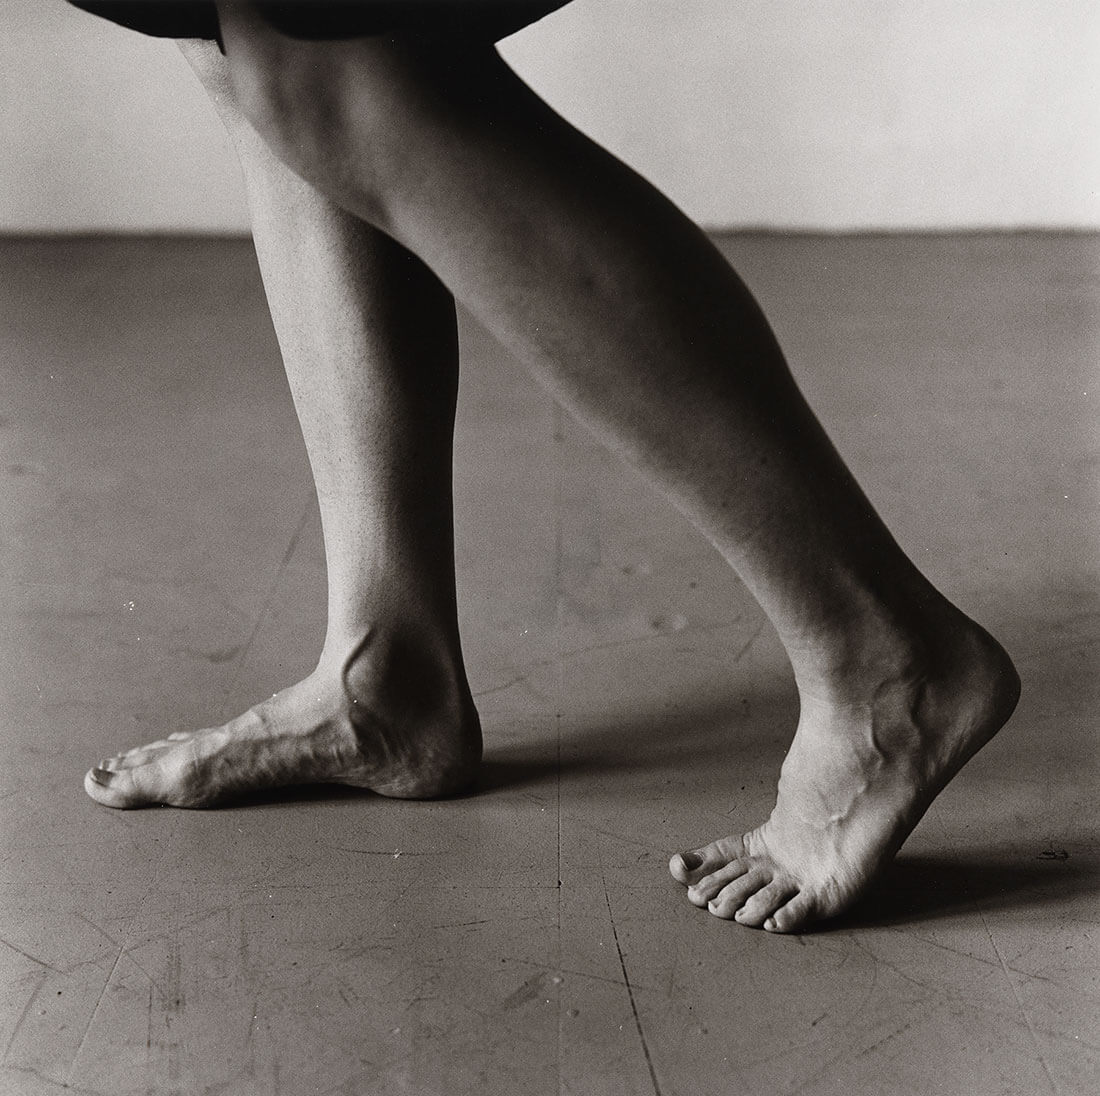 Dana Reitz's Legs, Walking